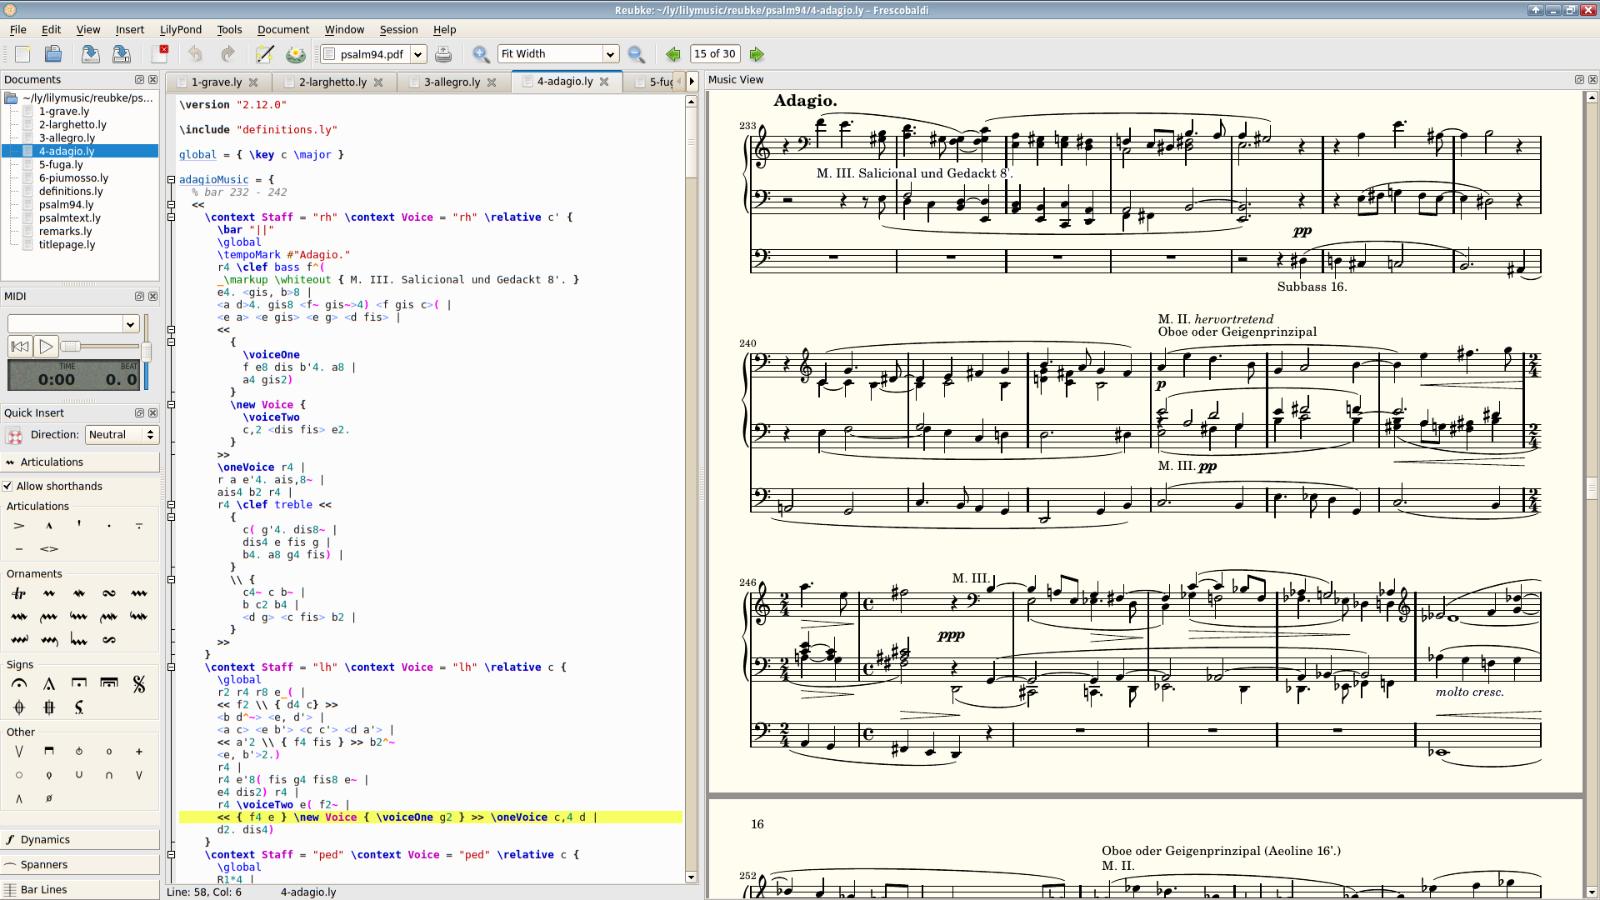 Frescobaldi (LilyPond Sheet Music Text Editor Software) Windows/Mac CD